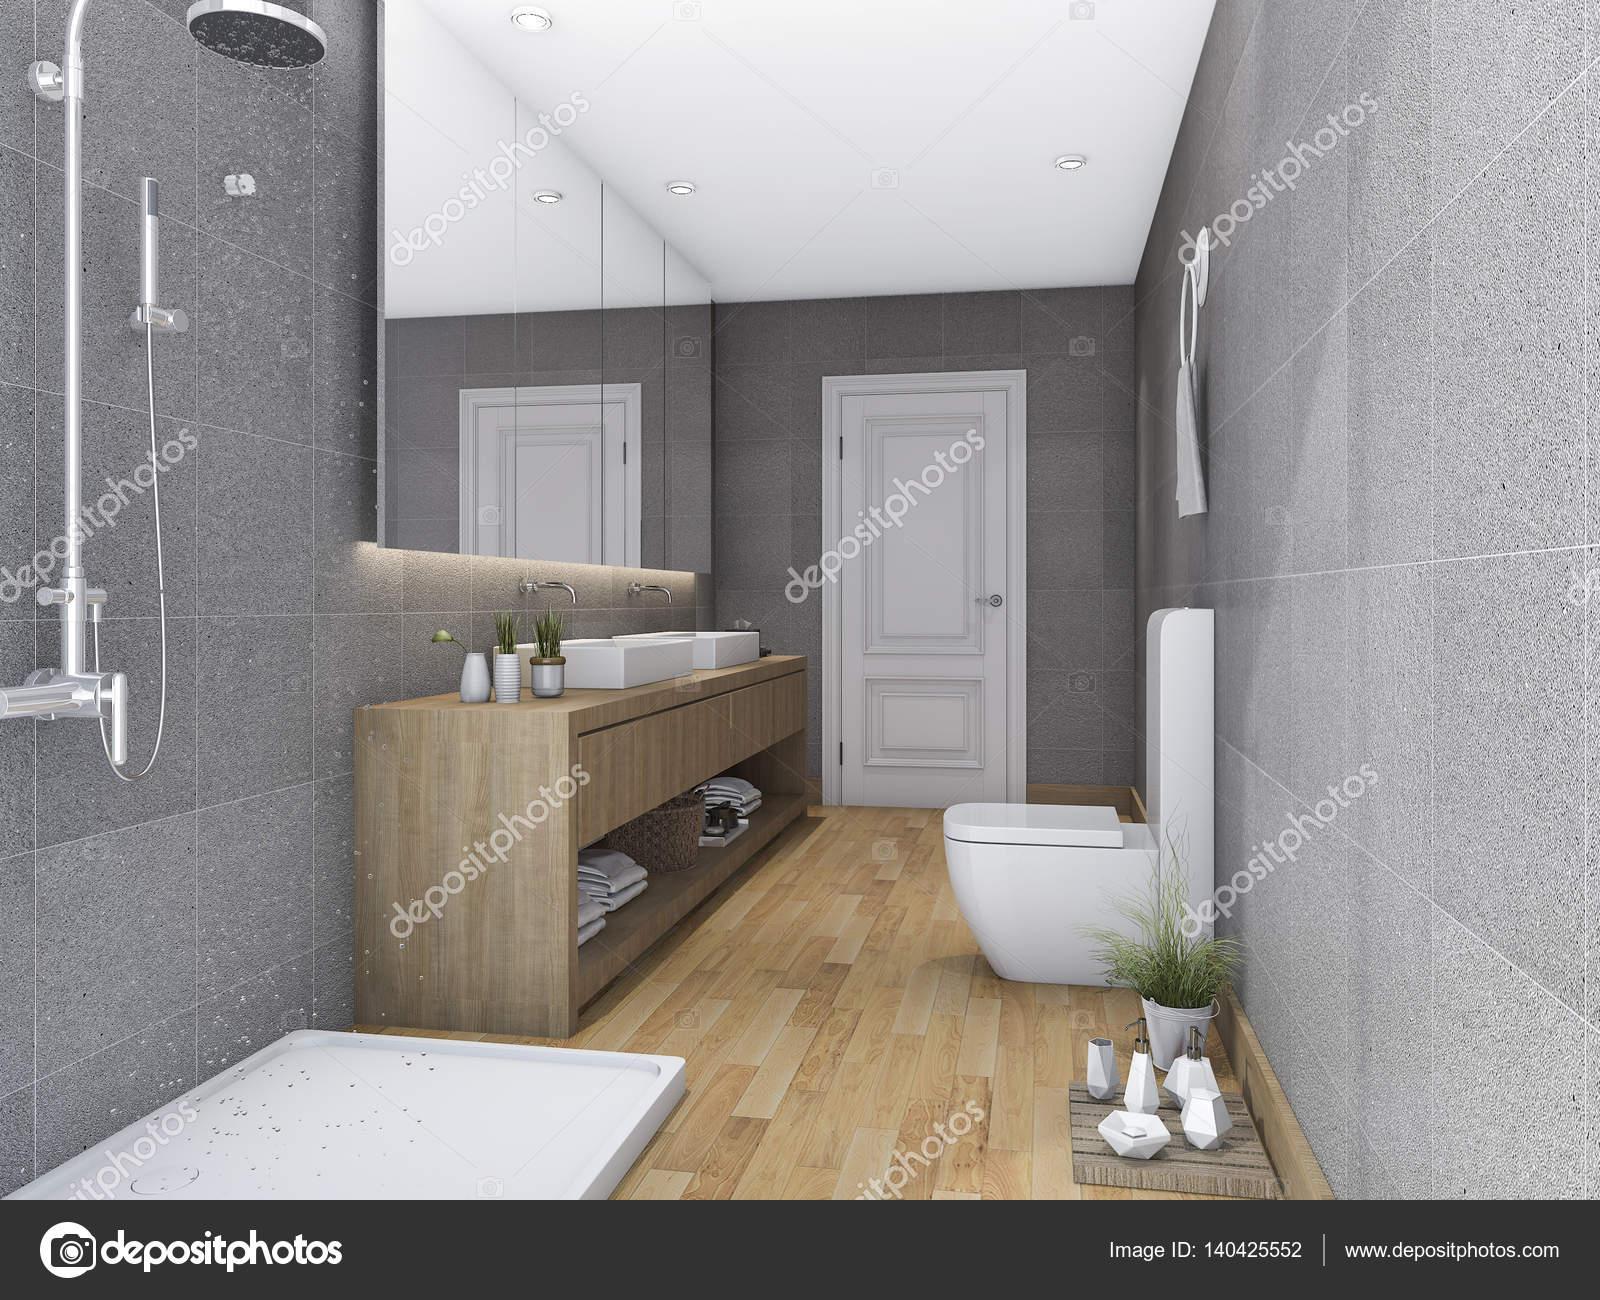 Hout In Badkamer : Badkamer modern hout badkamer modern veta keukens interieur veta